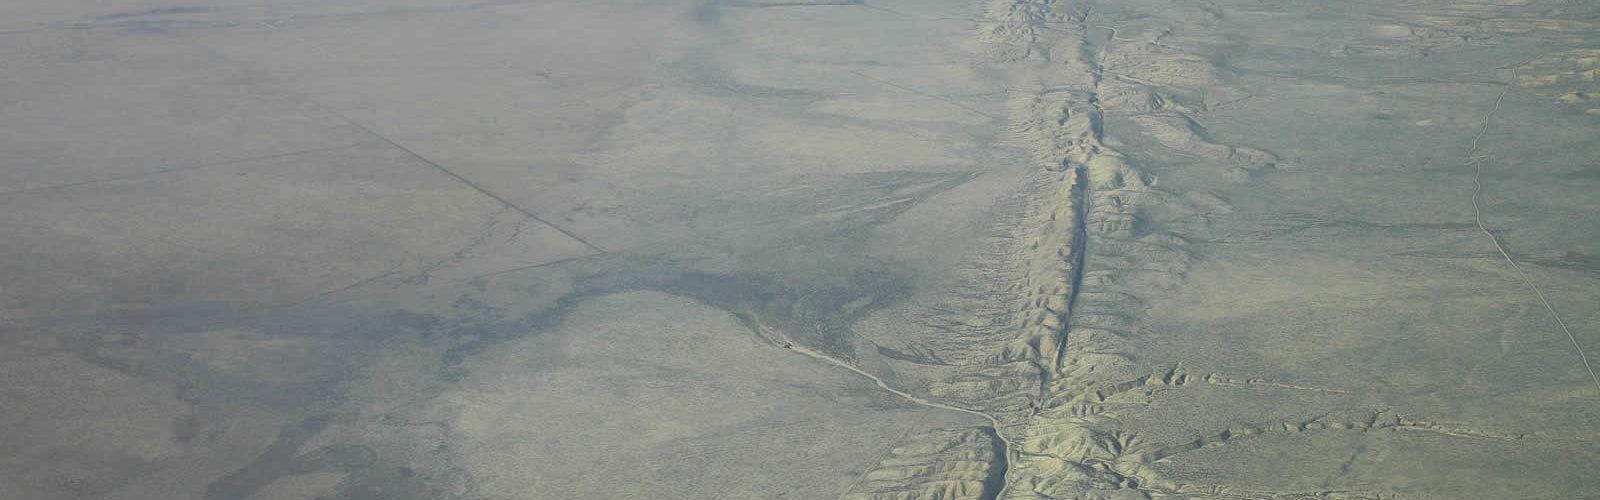 faille-san-andreas-seismes-une